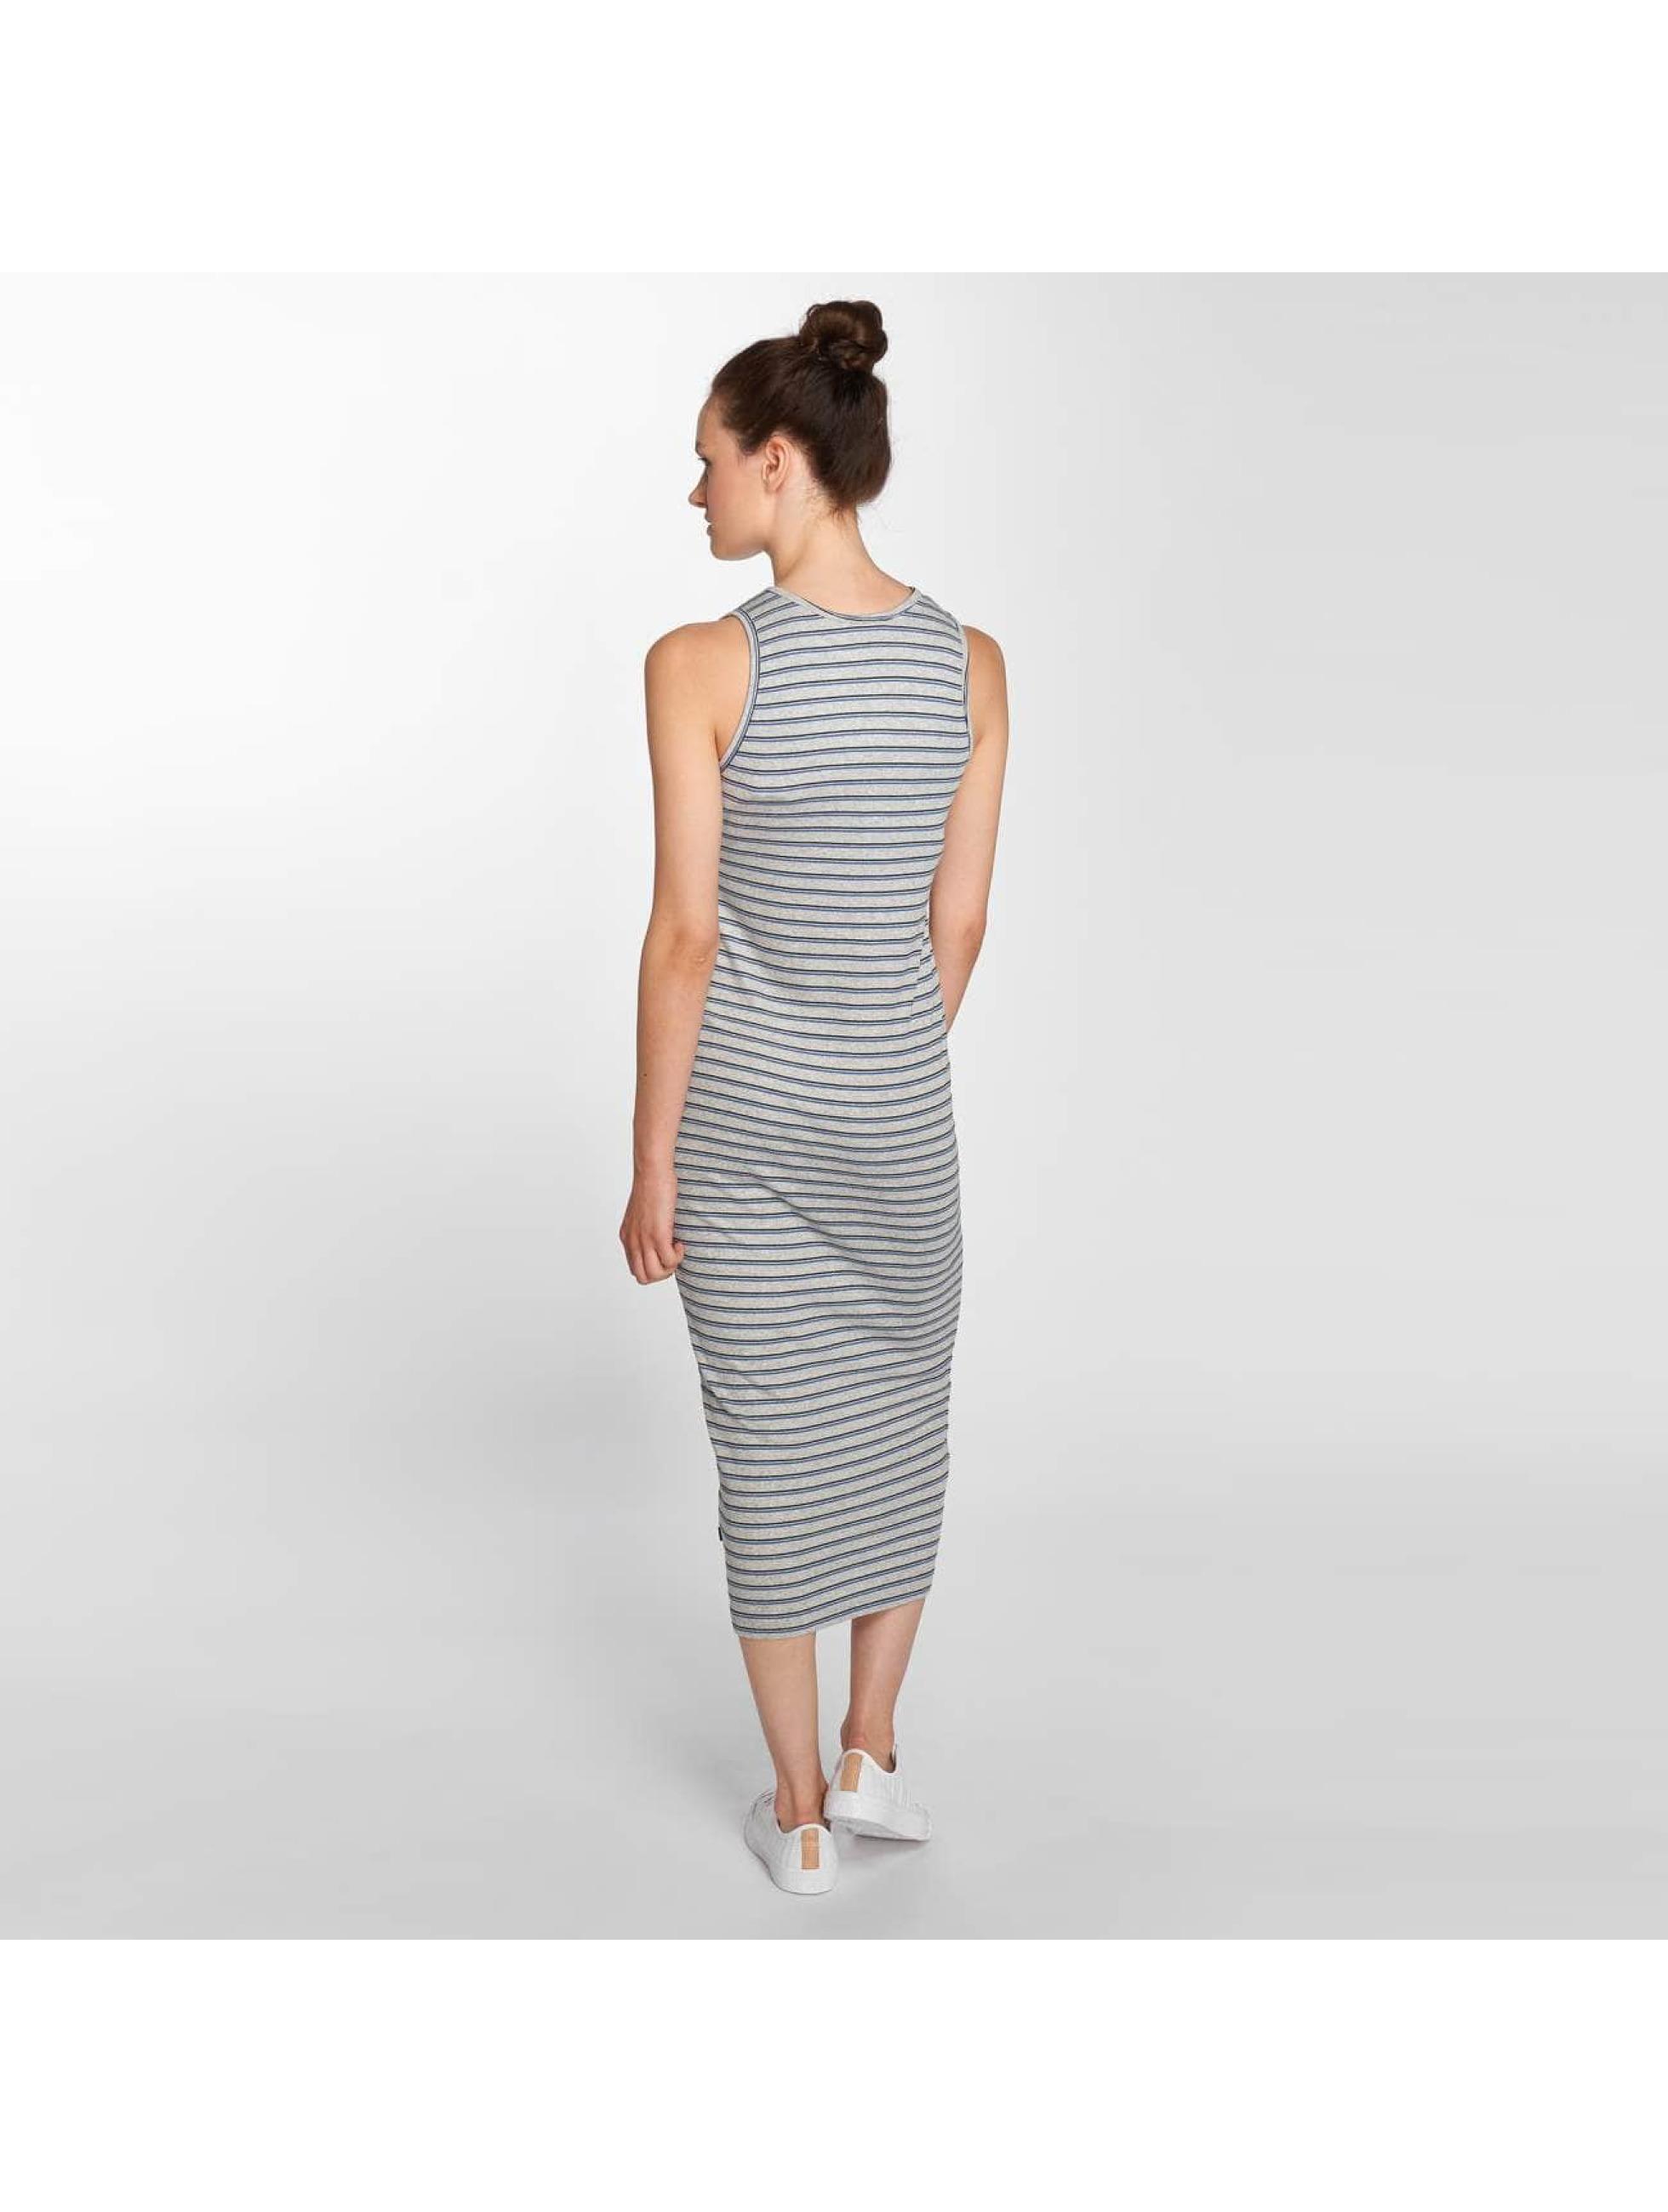 Lee Dress Jersey gray